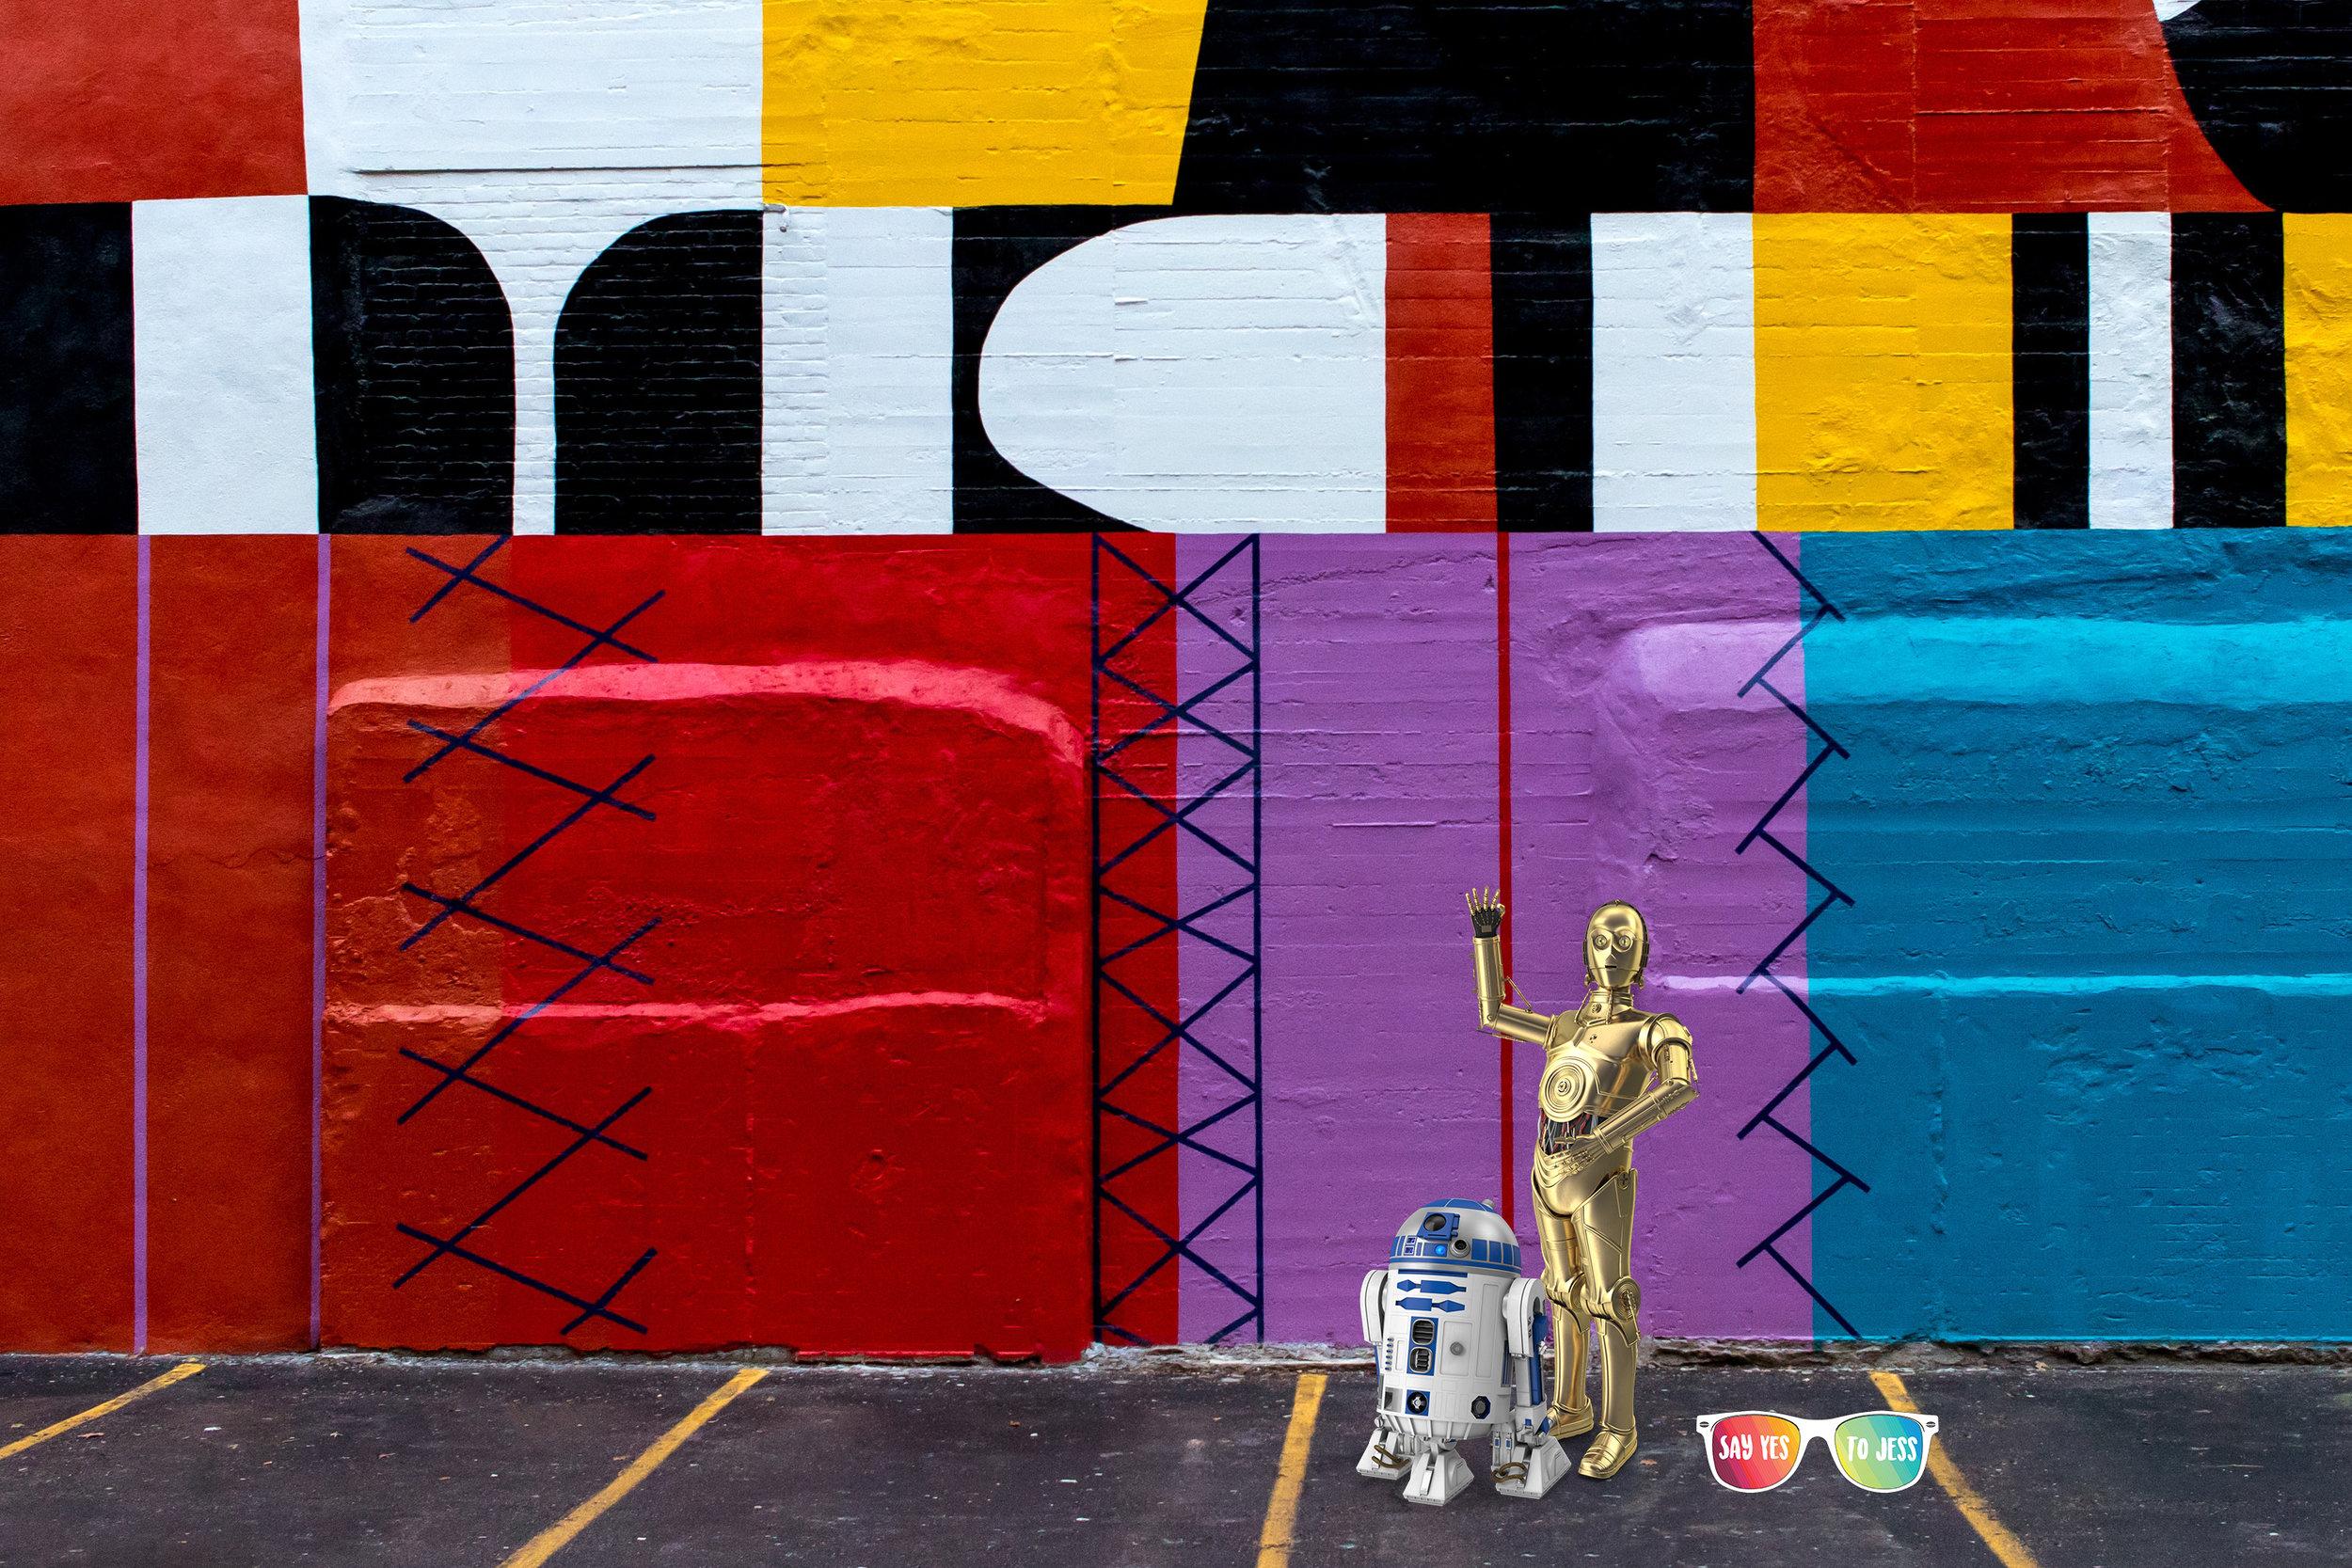 Say-Yes-To-Jess-Cincinnati-Mural-R2D2-C3PO-Print.jpg